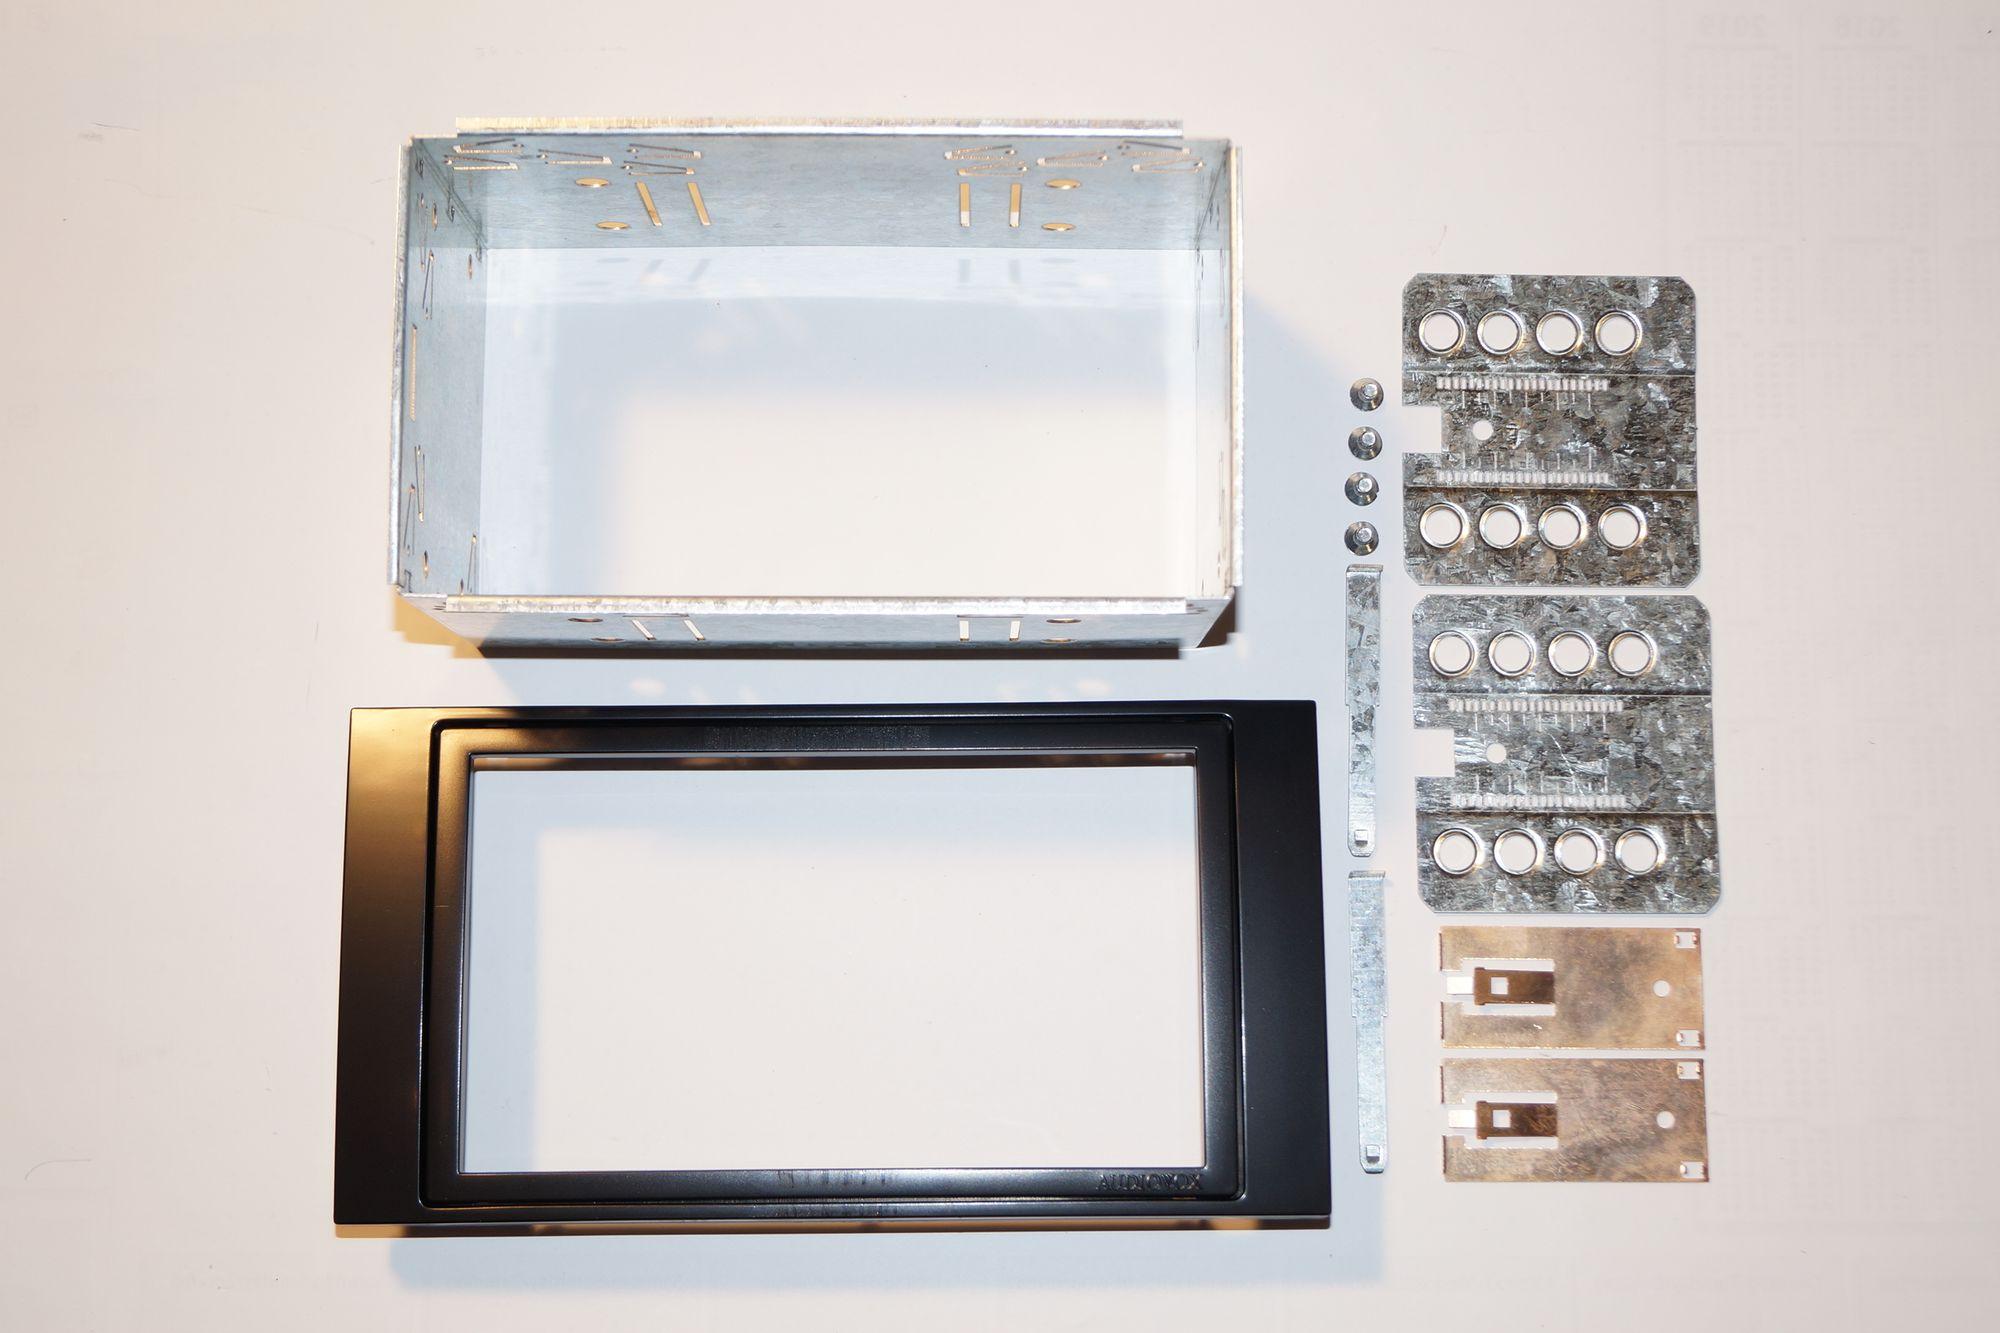 Audiovox Doppel-DIN-Blende Opel, Antara, Astra H, Corsa D, Zafira II Neu Ware 001